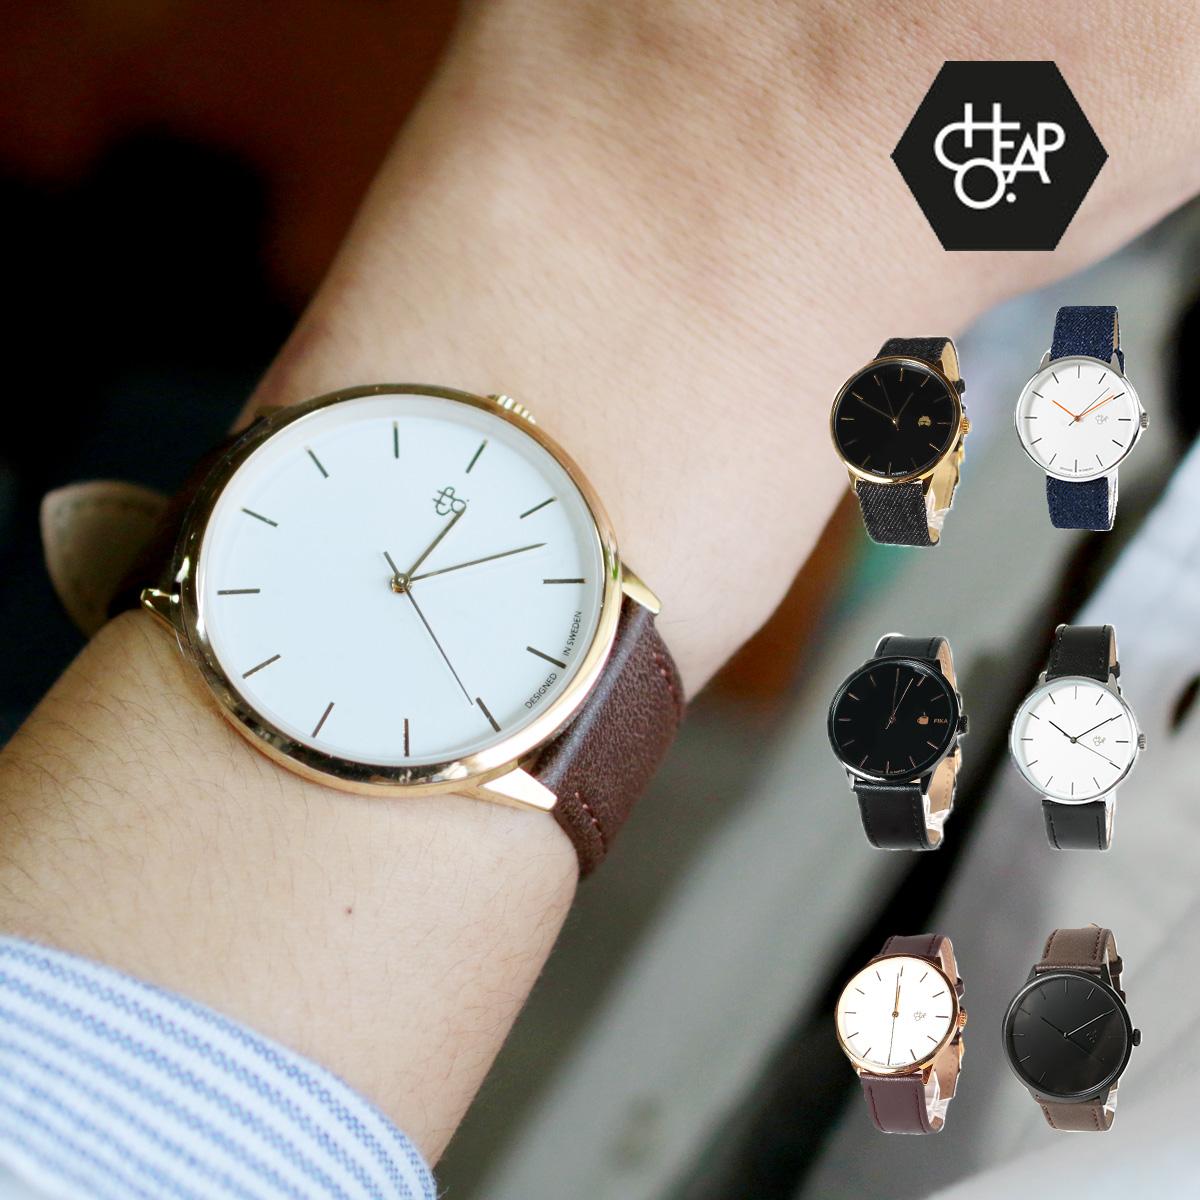 PUレザーベルト クオーツ 腕時計 北欧 お洒落 プレゼント ギフト メンズ レディース ユニセックスCheapo チーポ 父の日